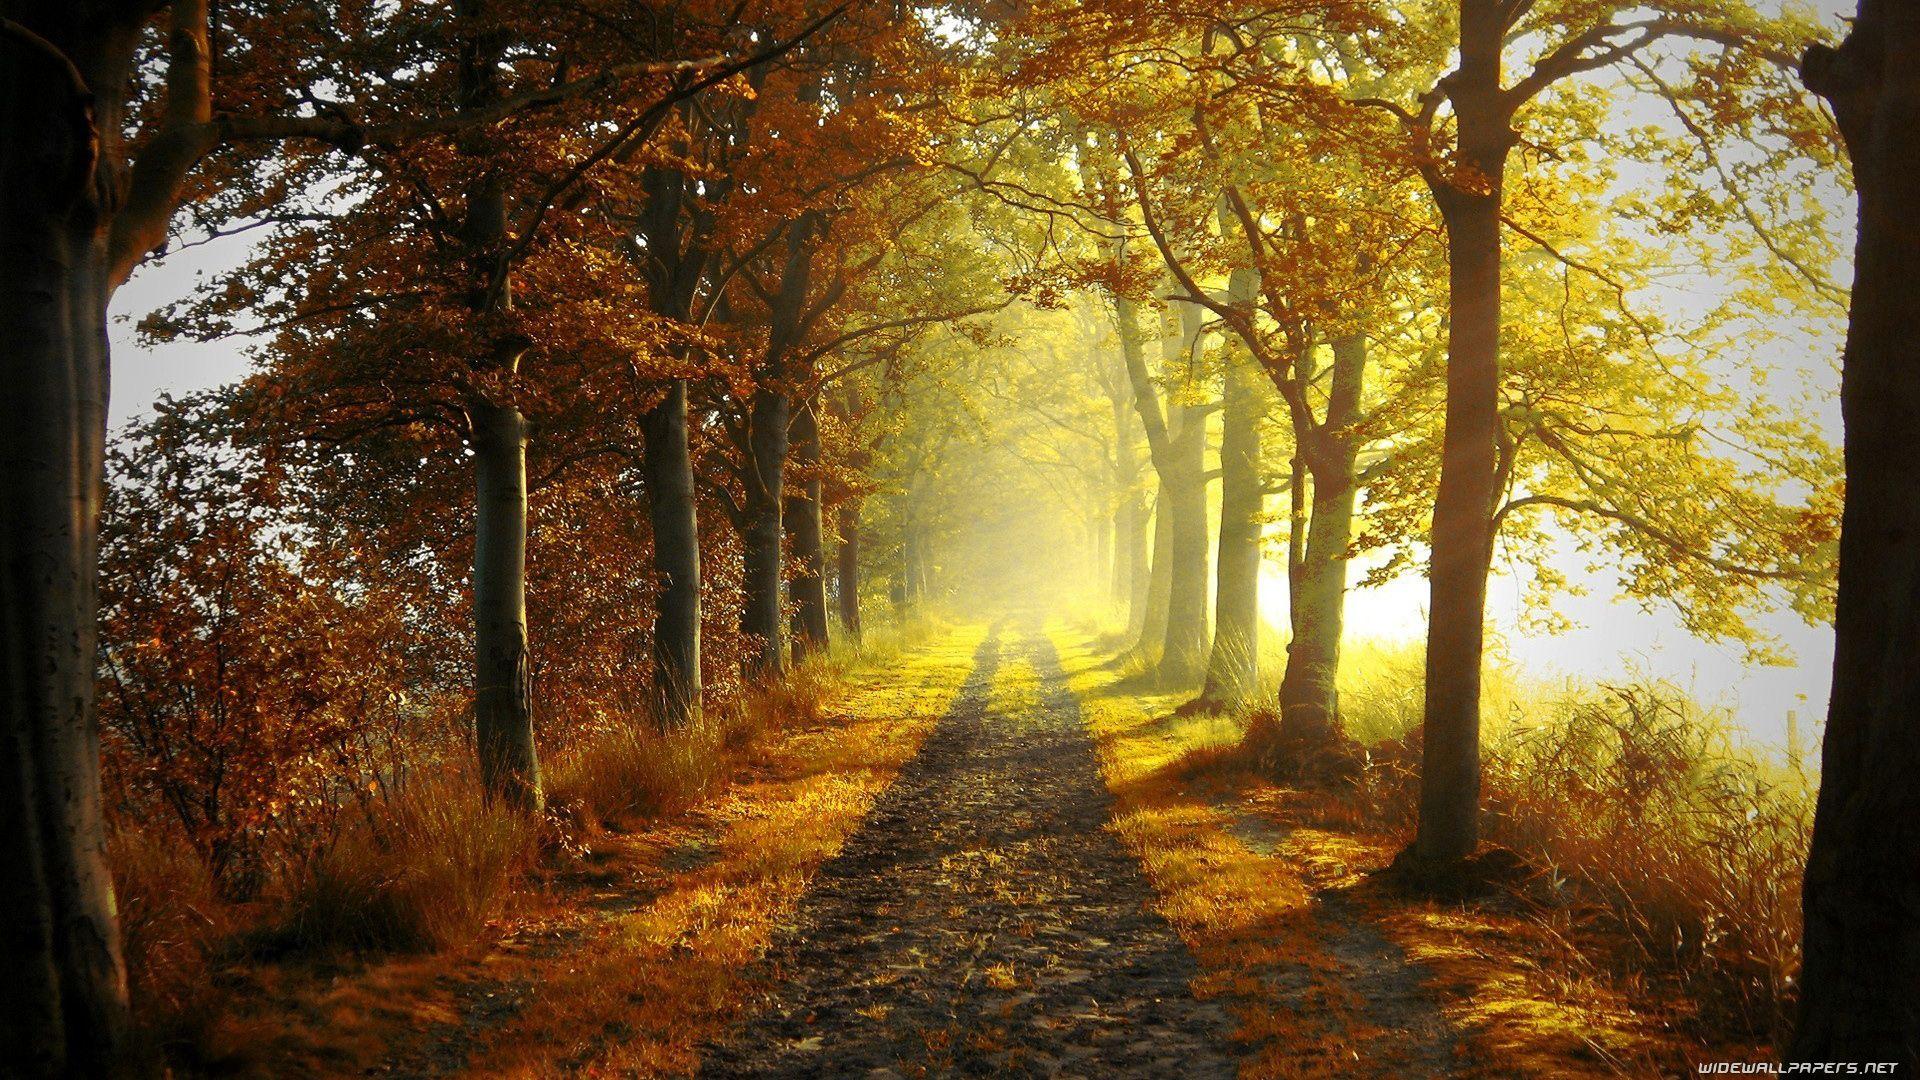 autumn nature pictures net mod nature autumn